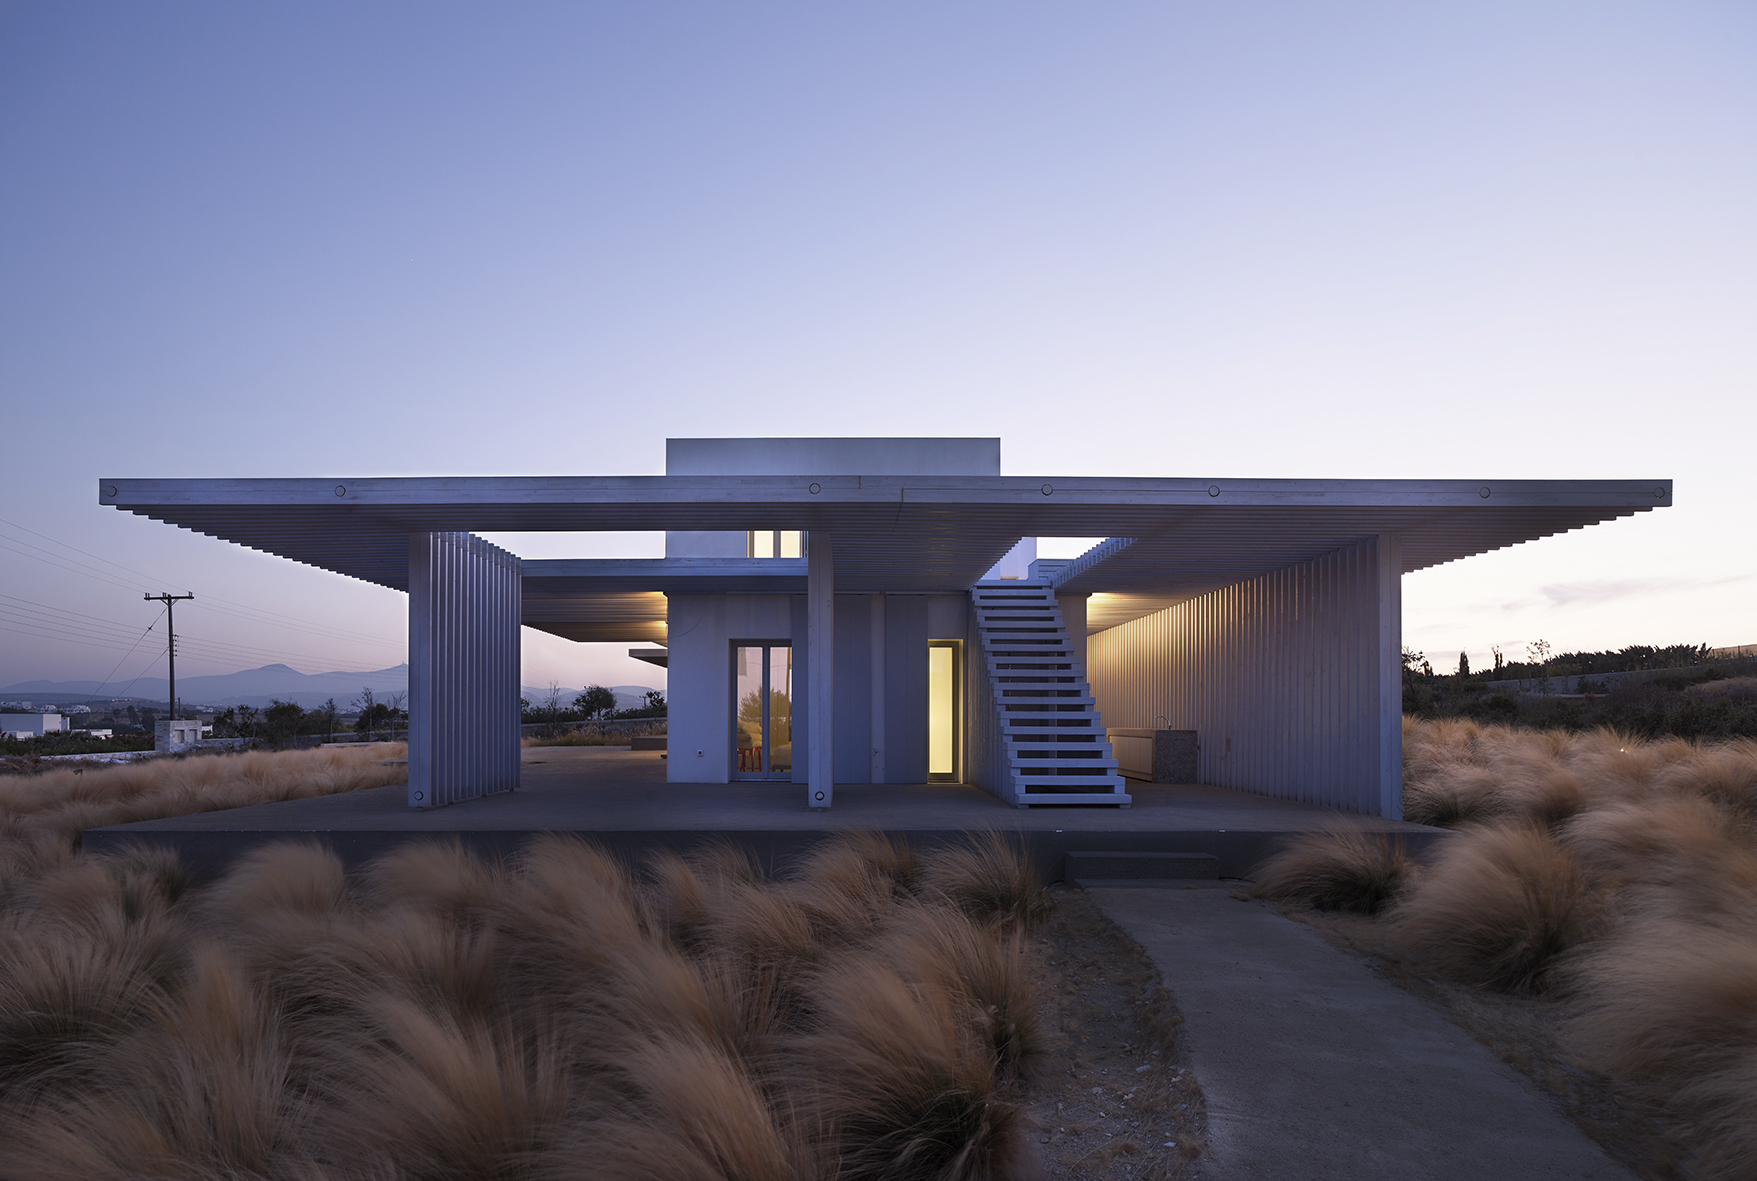 Houses A·2 / buerger katsota architects